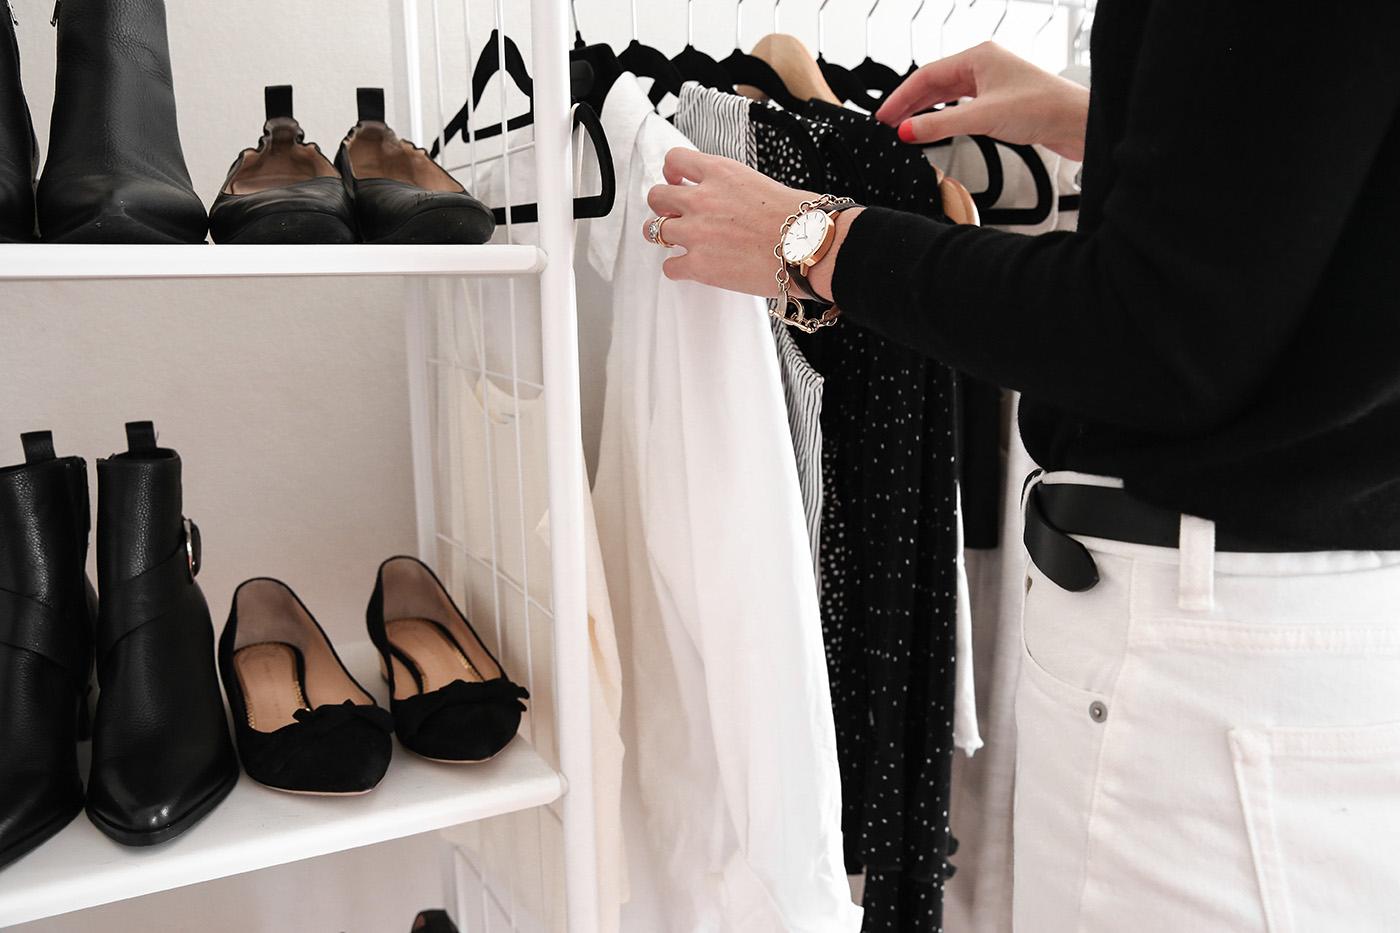 capsule wardrobe style uniform minimal closet